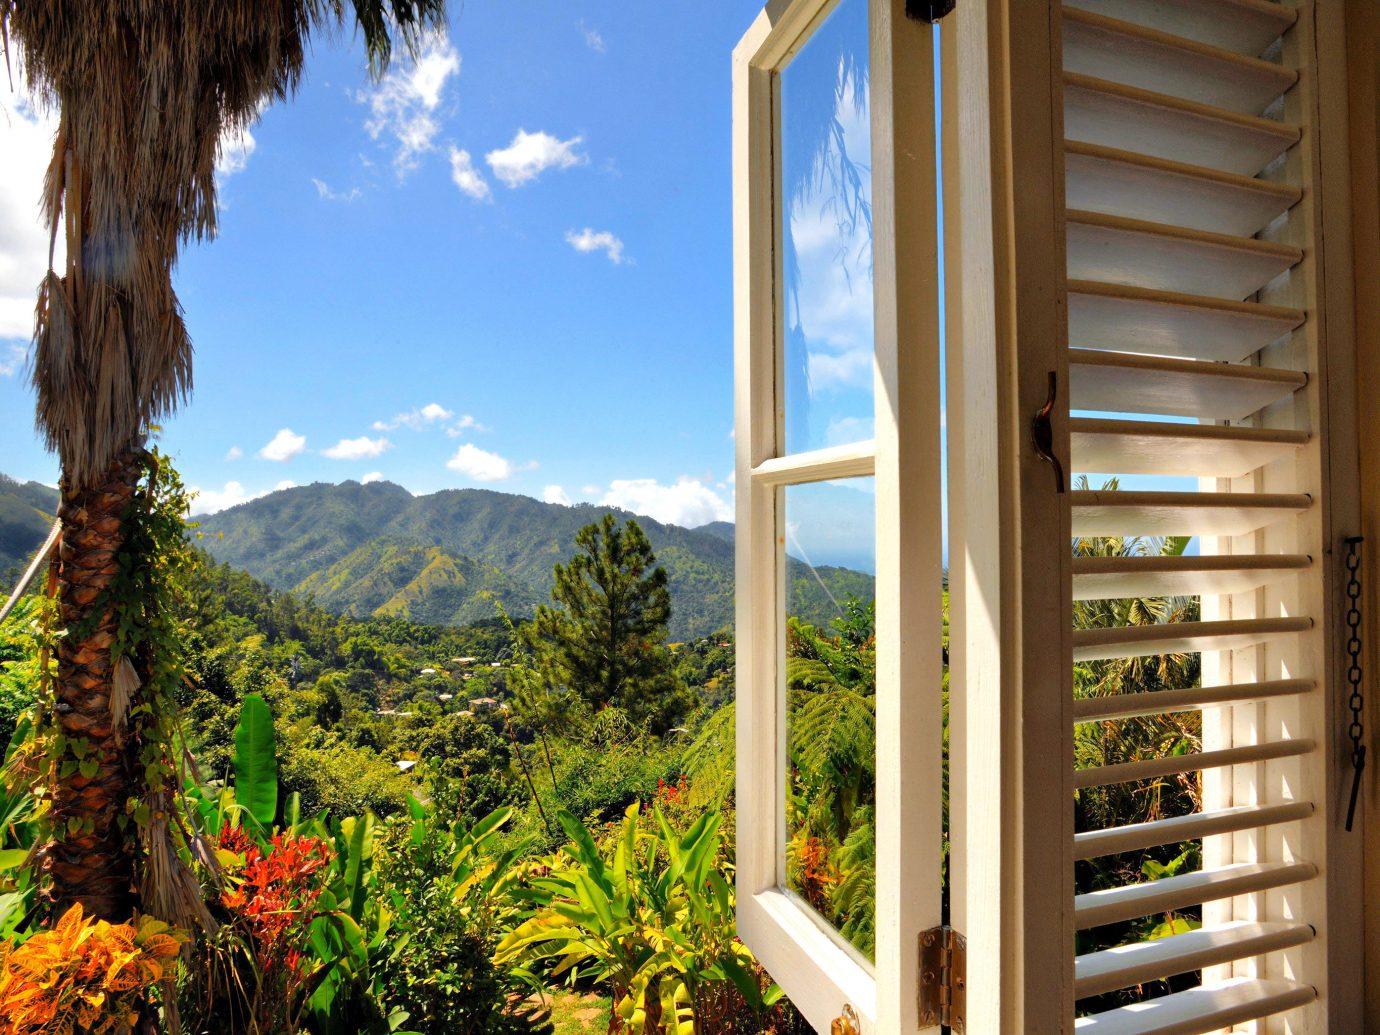 Hotels Trip Ideas tree outdoor building estate Resort